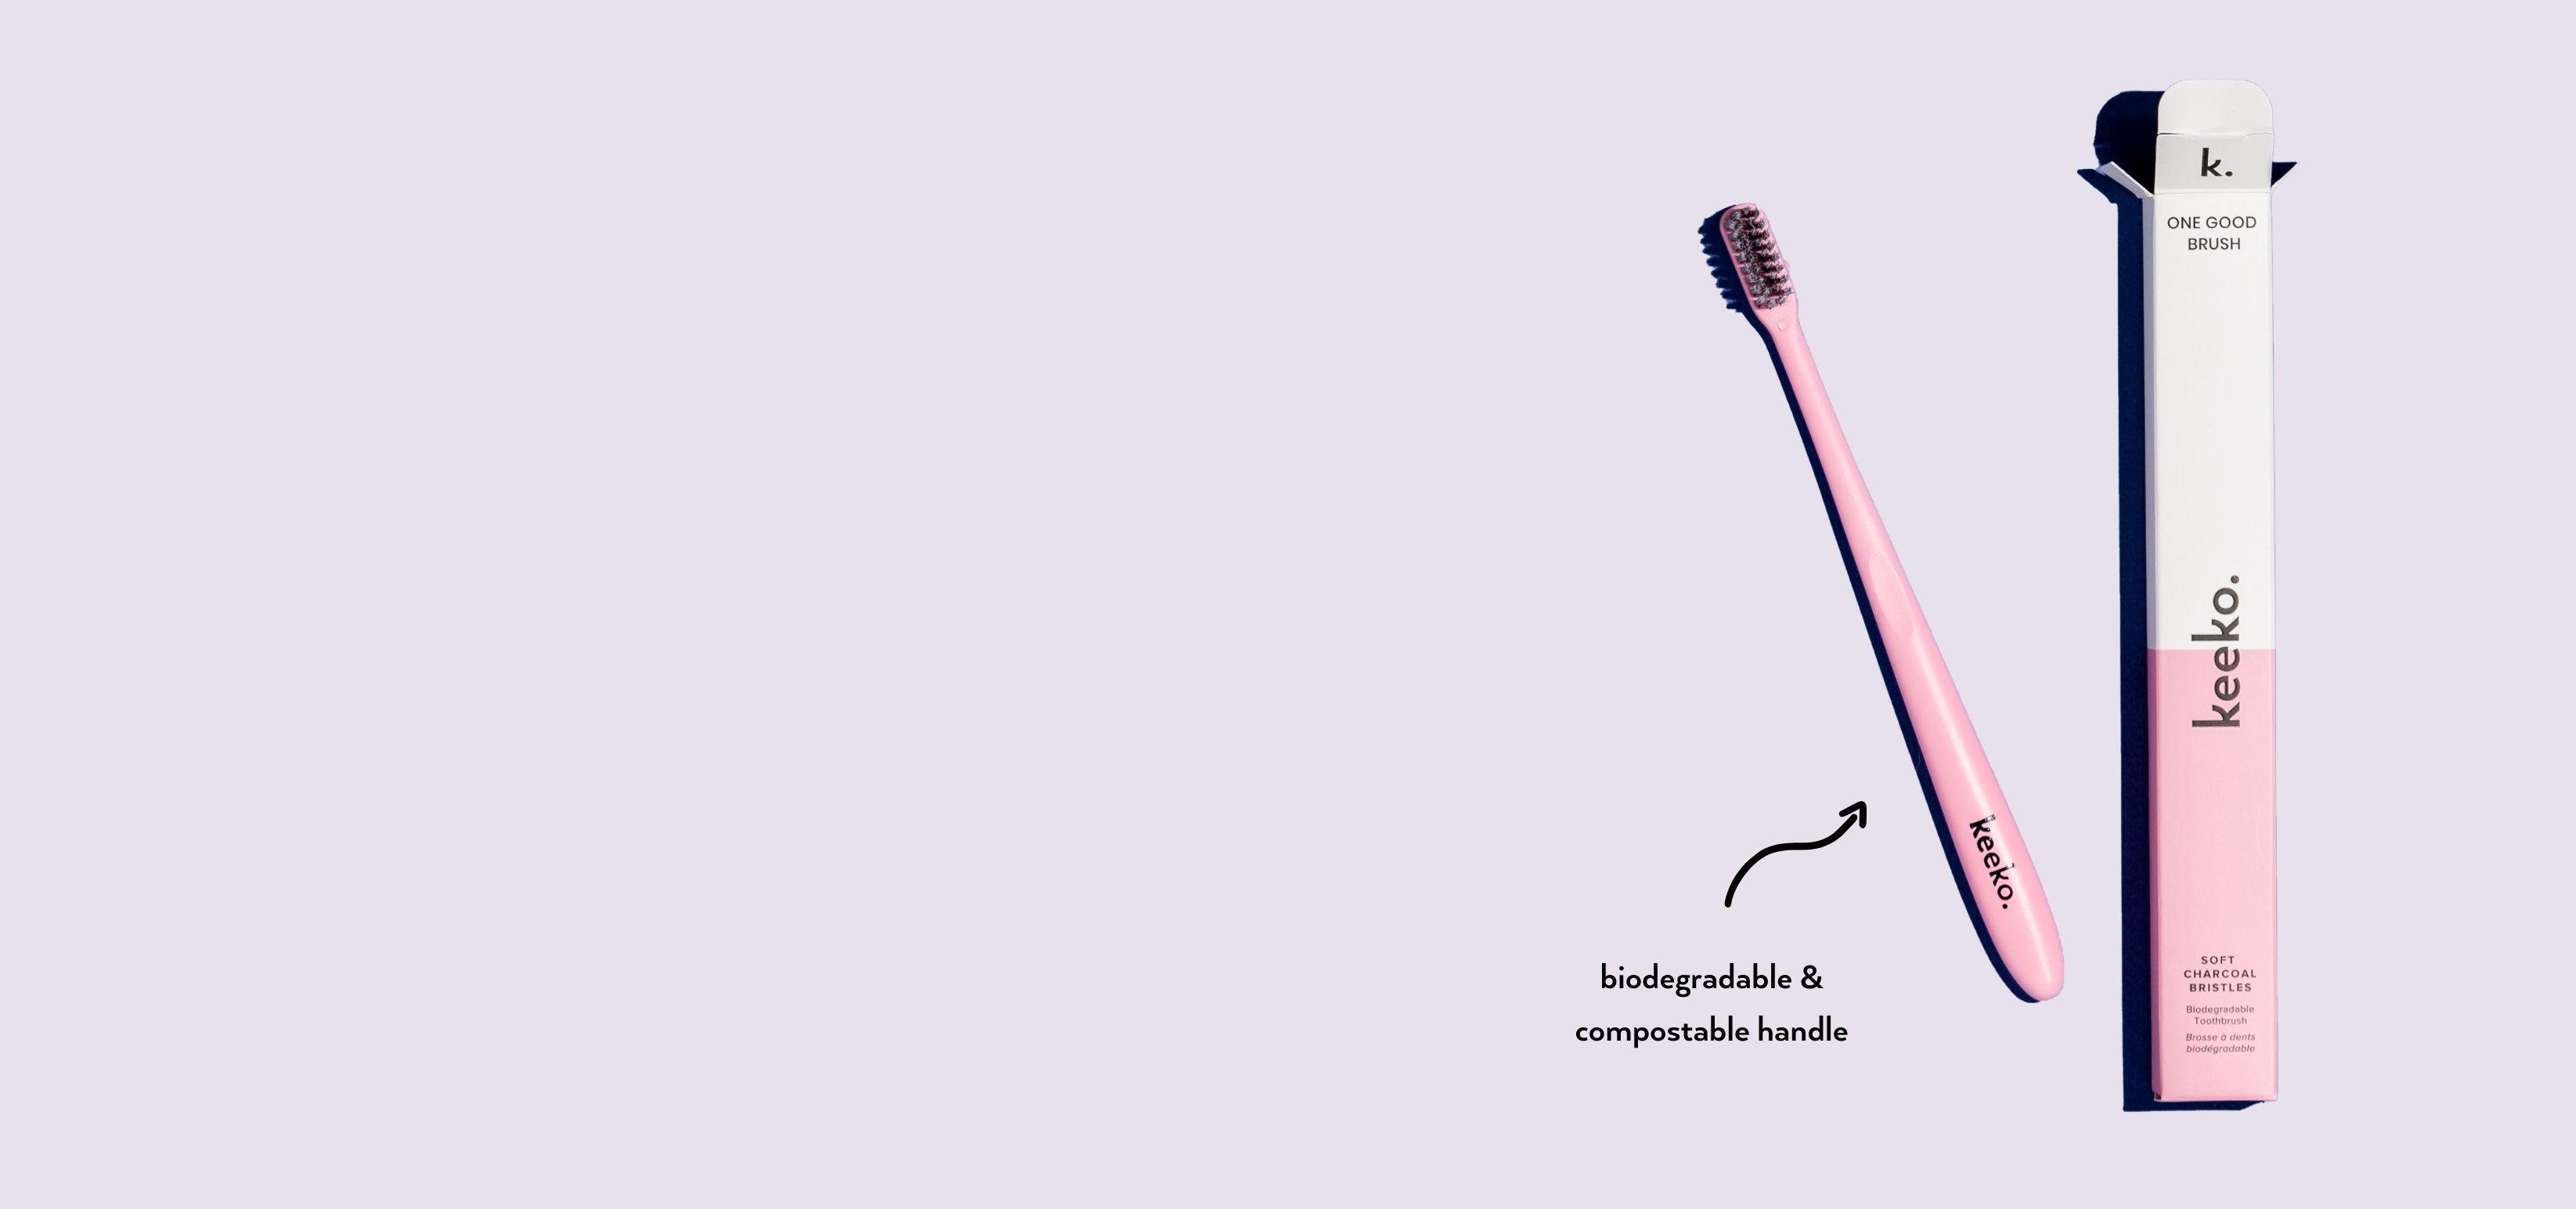 Keeko - One Good Brush - Biodegradable Toothbrush